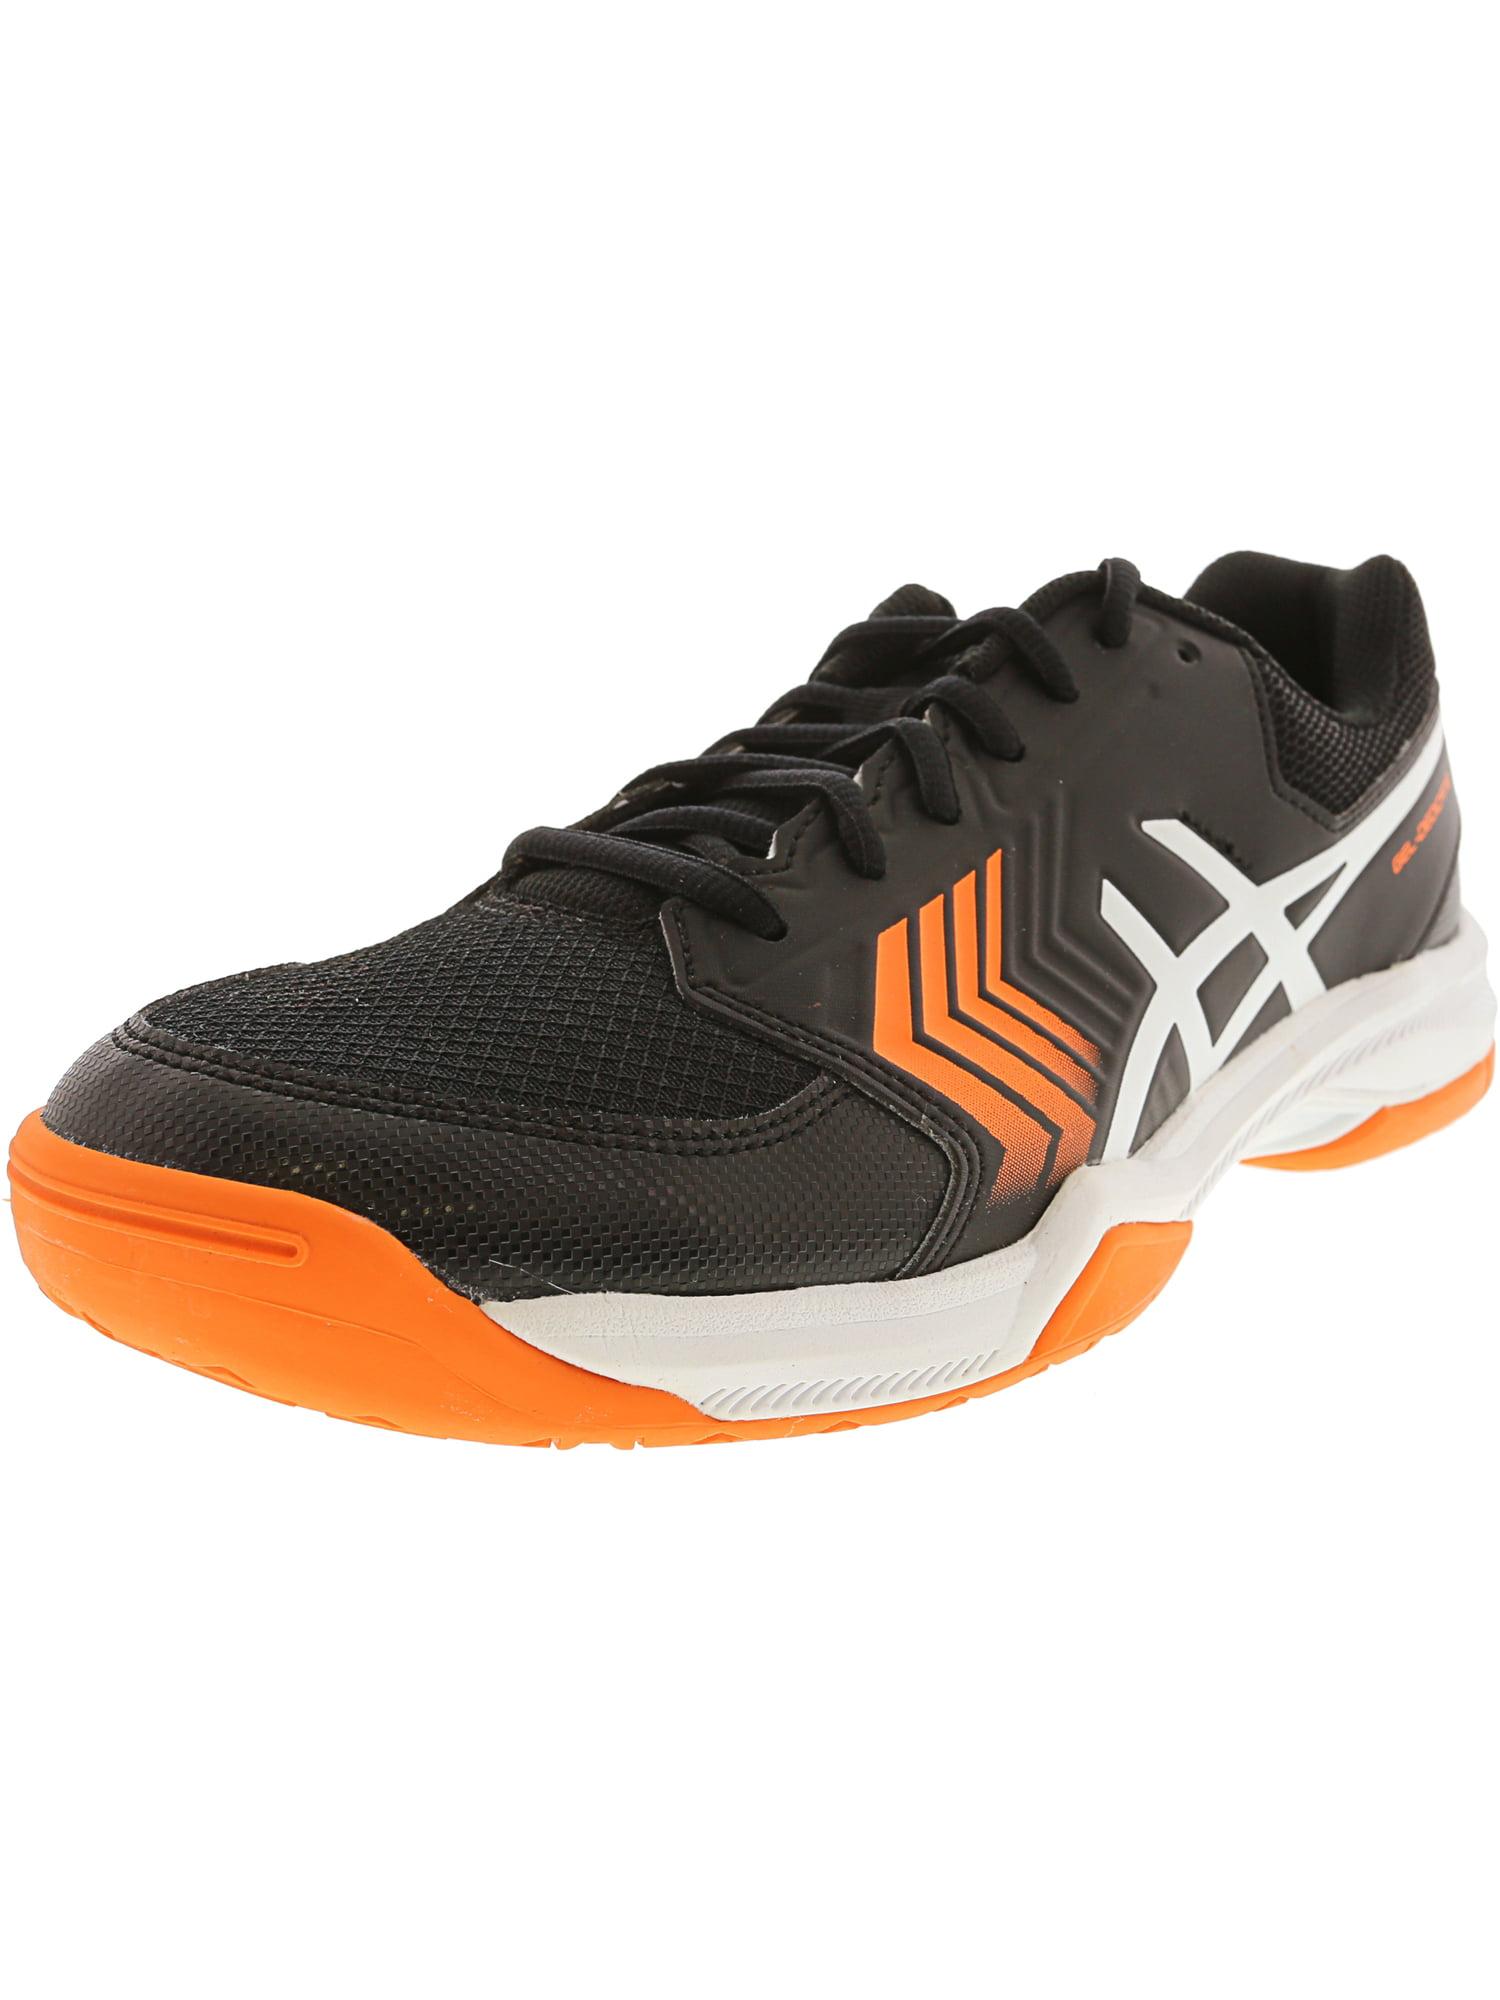 Asics Men's Gel-Dedicate 5 White / Silver Low Top Tennis Shoe - 9M